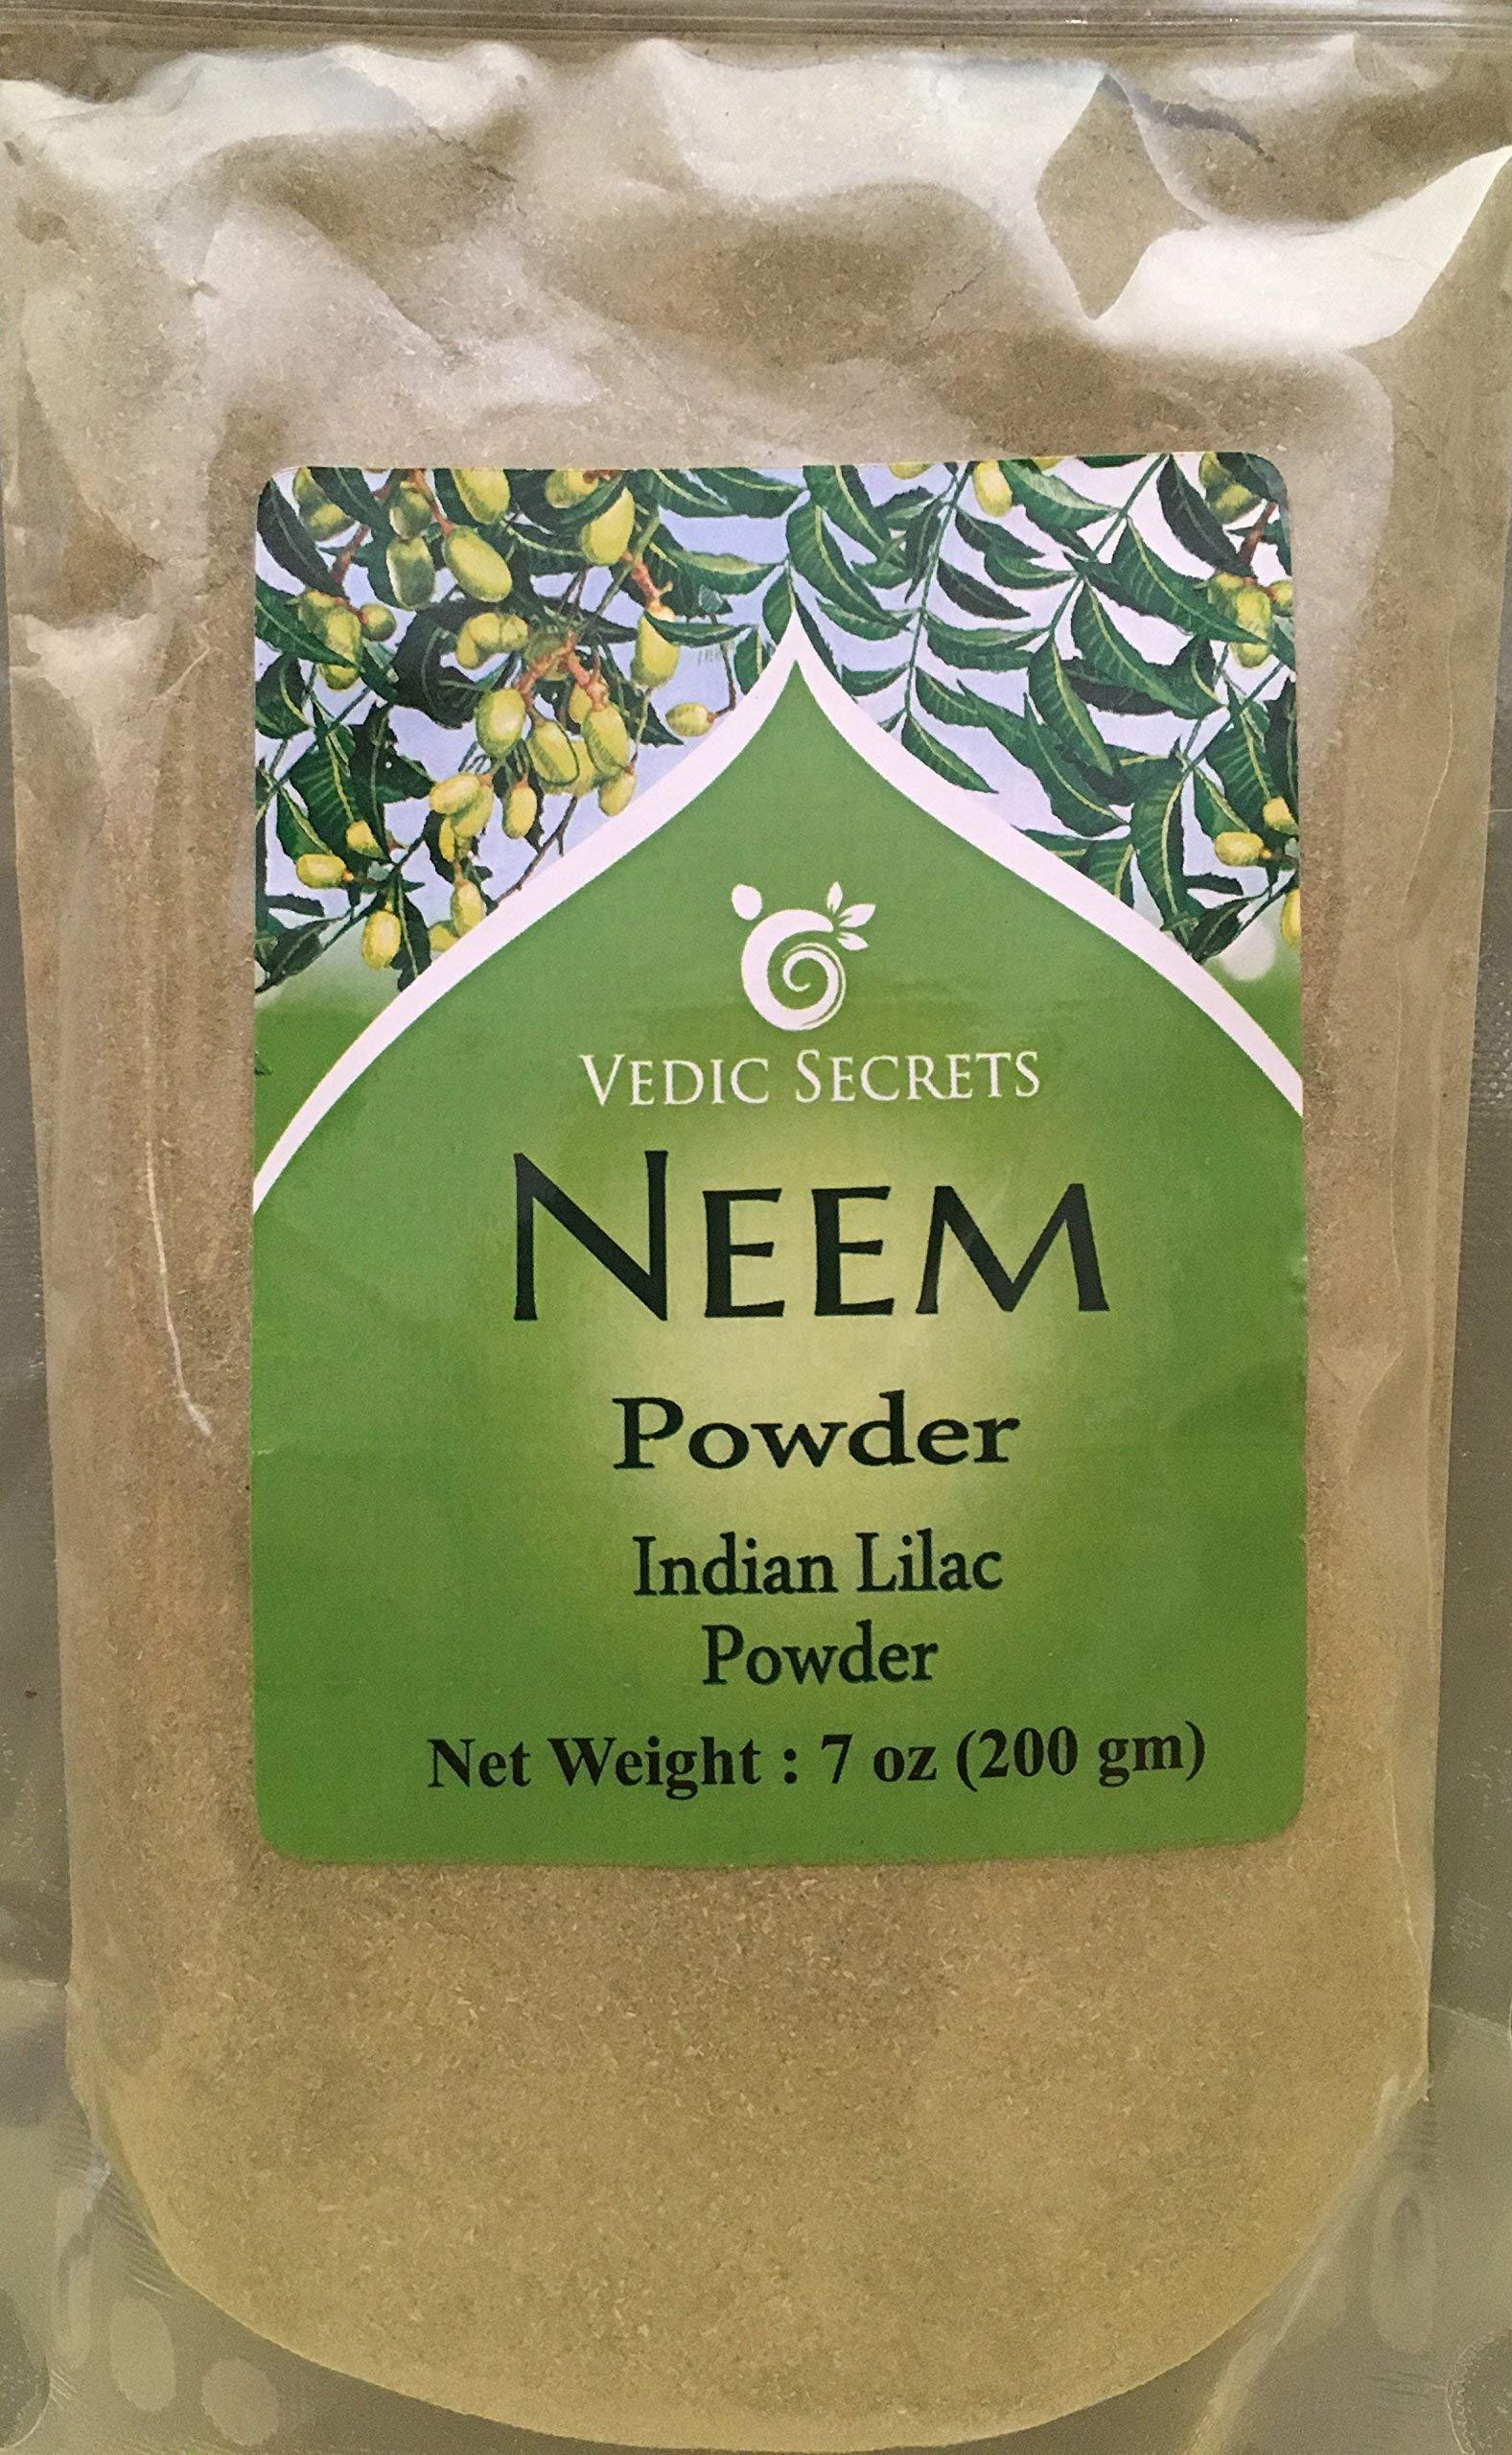 Vedic Secrets Powder - Neem (Indian Lilac)